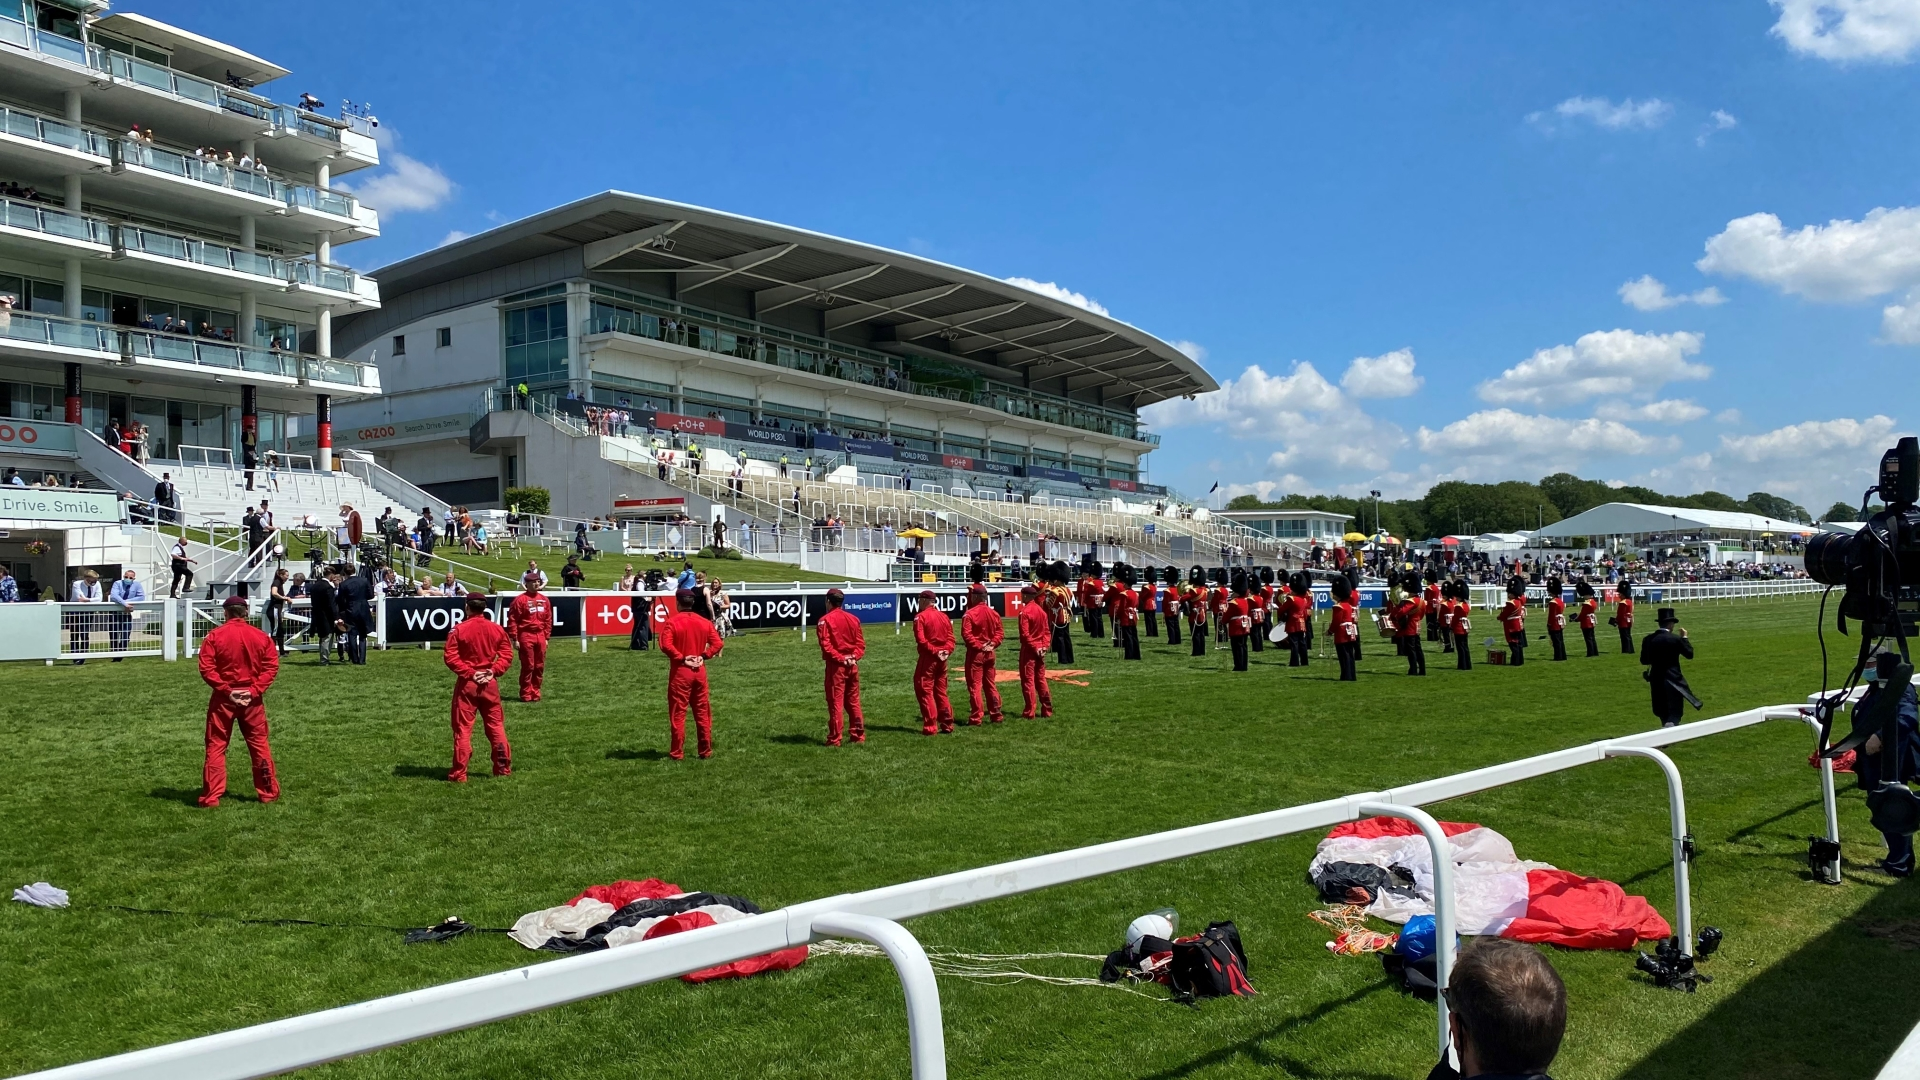 Epsom Downs 2021 Red Devils parachute display team